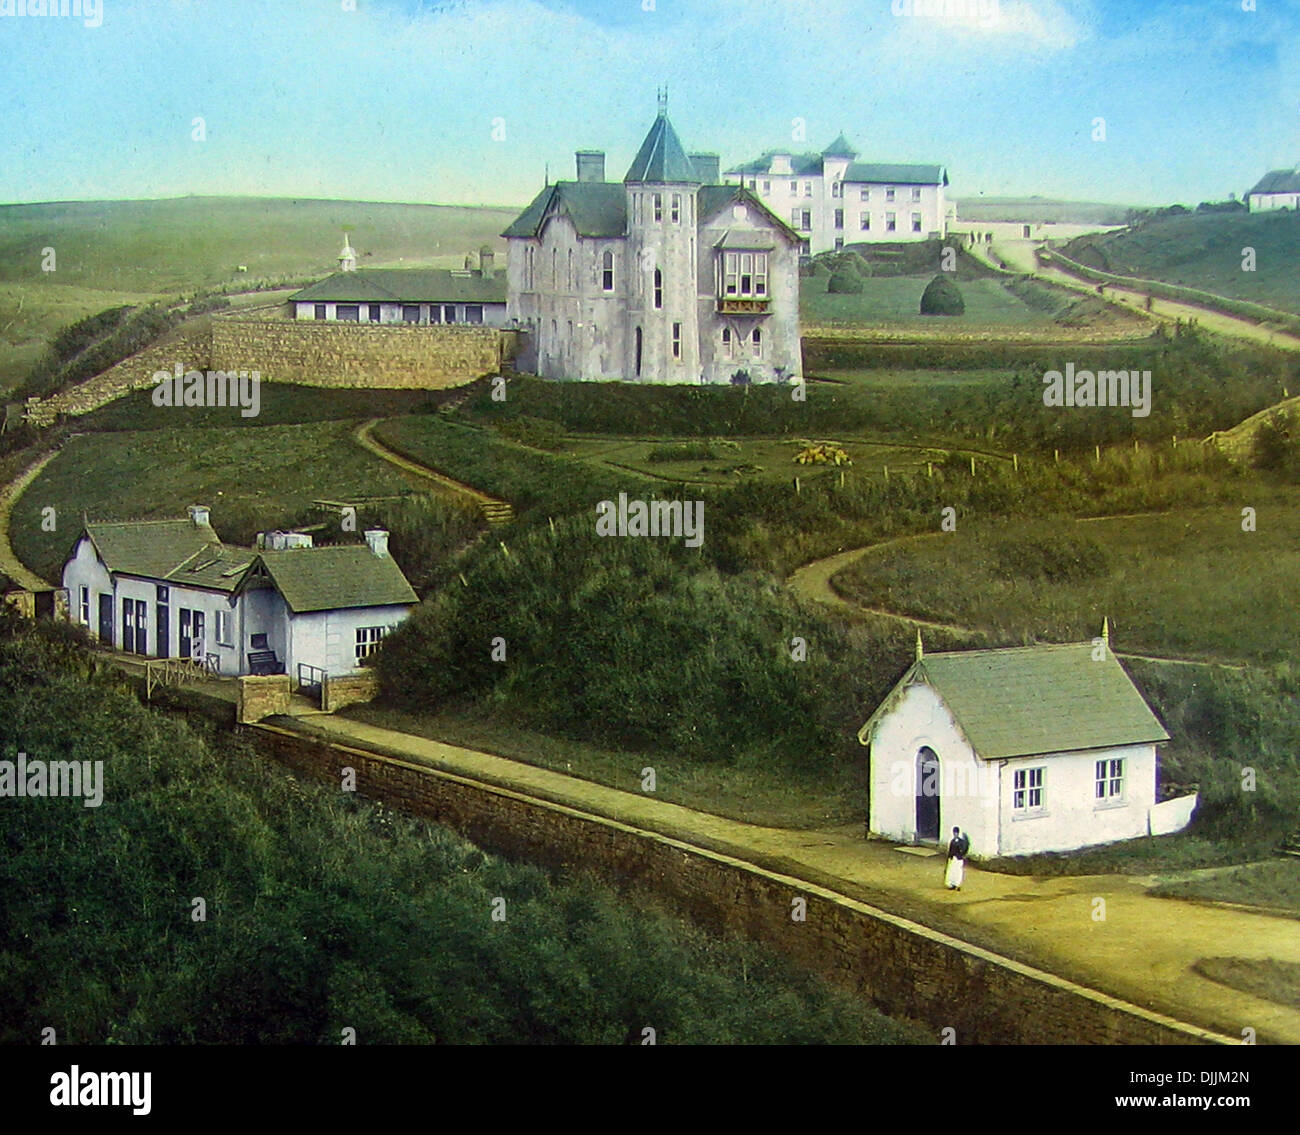 Lisdoonvarna County Clare Victorian period - Stock Image